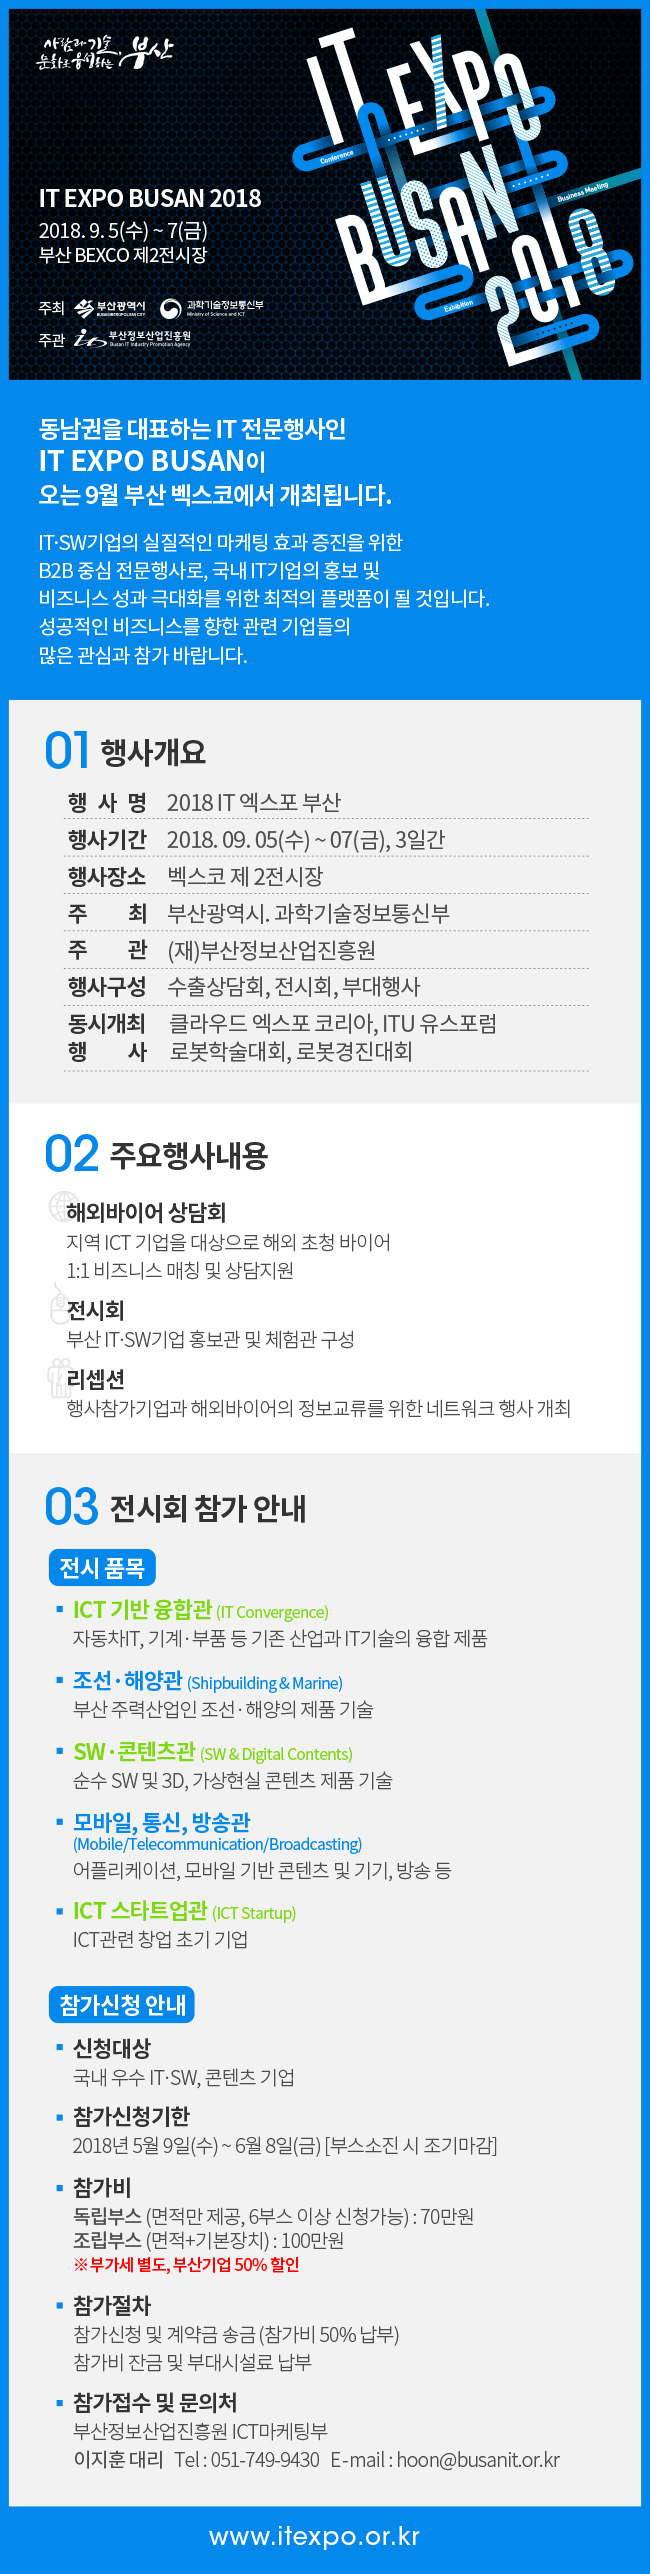 2018 IT 엑스포 부산 참가기업 모집